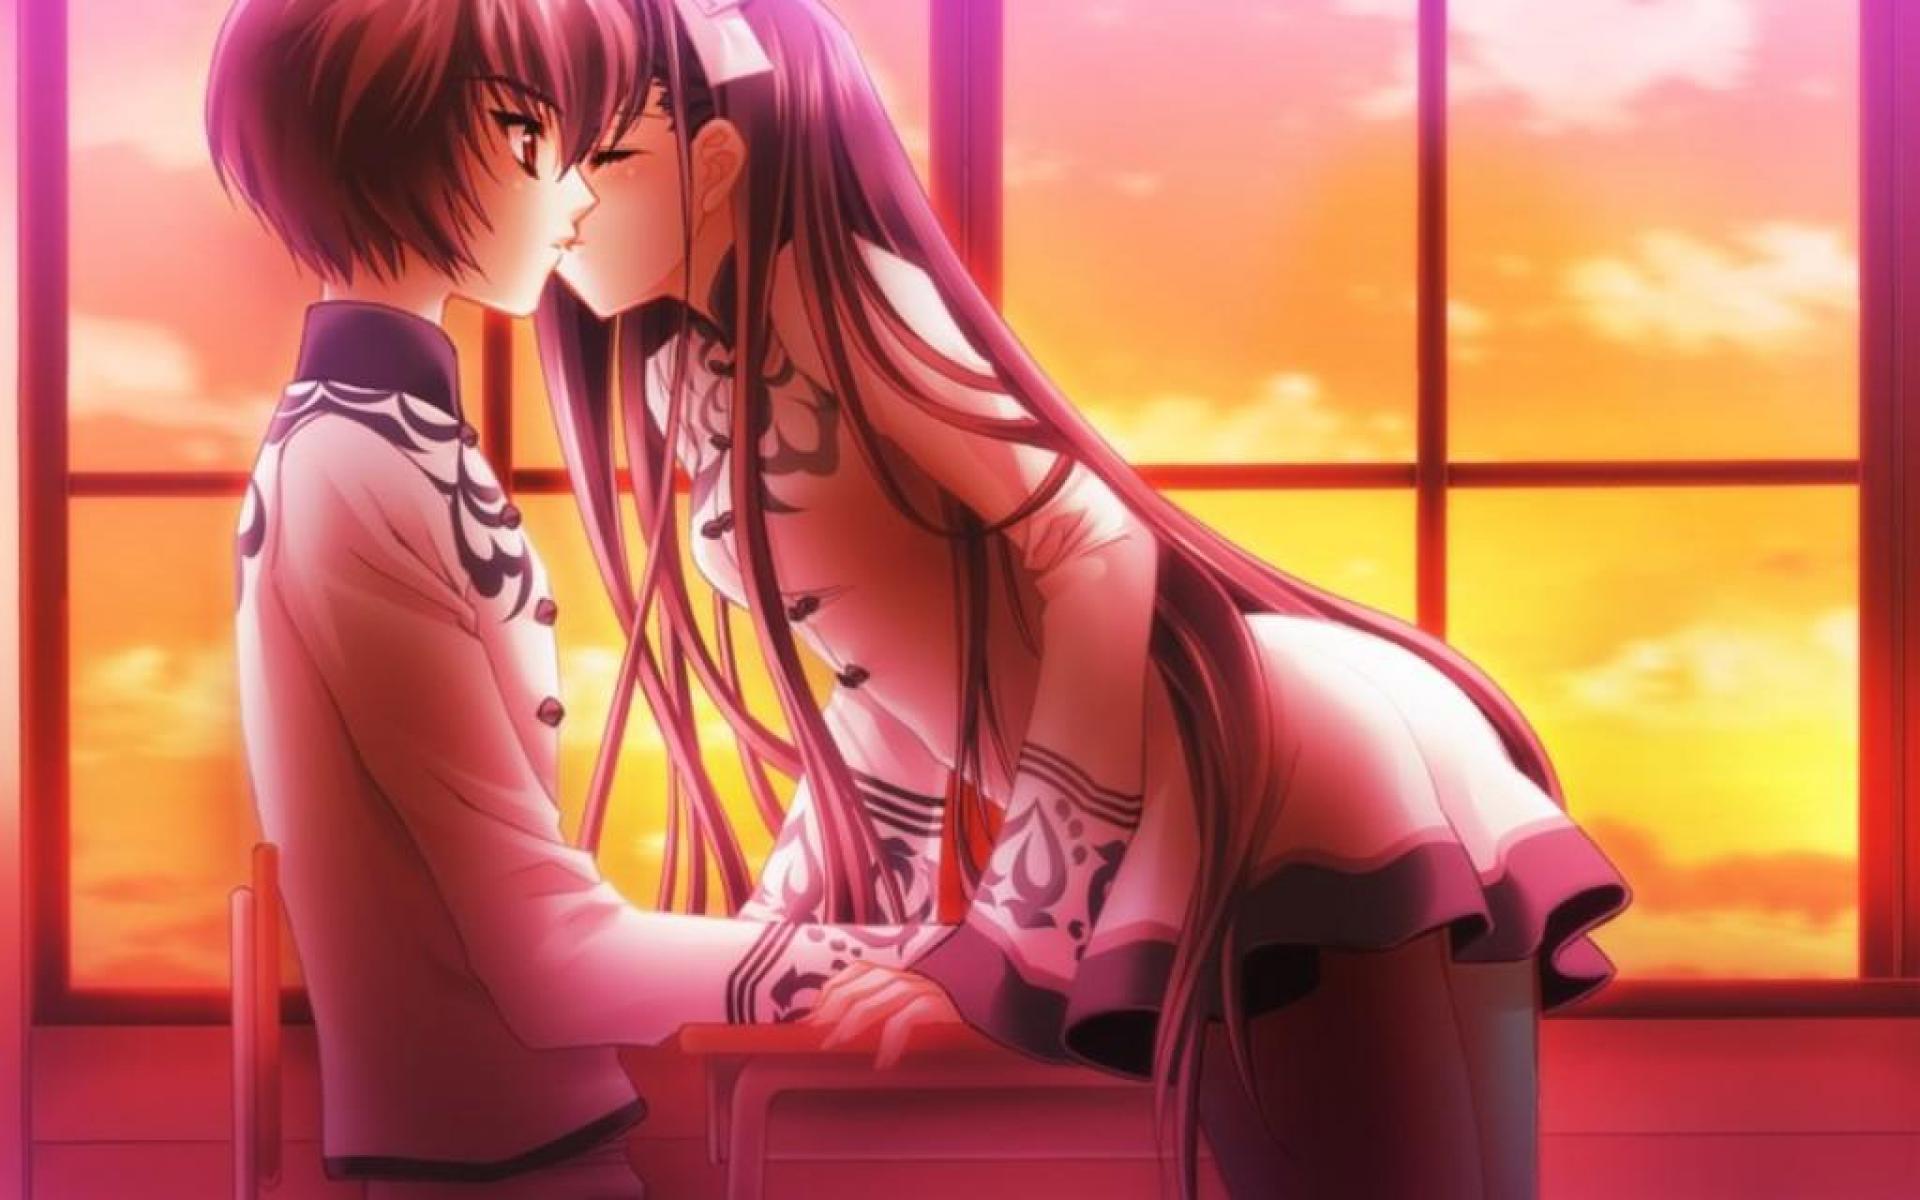 Mangas/animes : l'amour